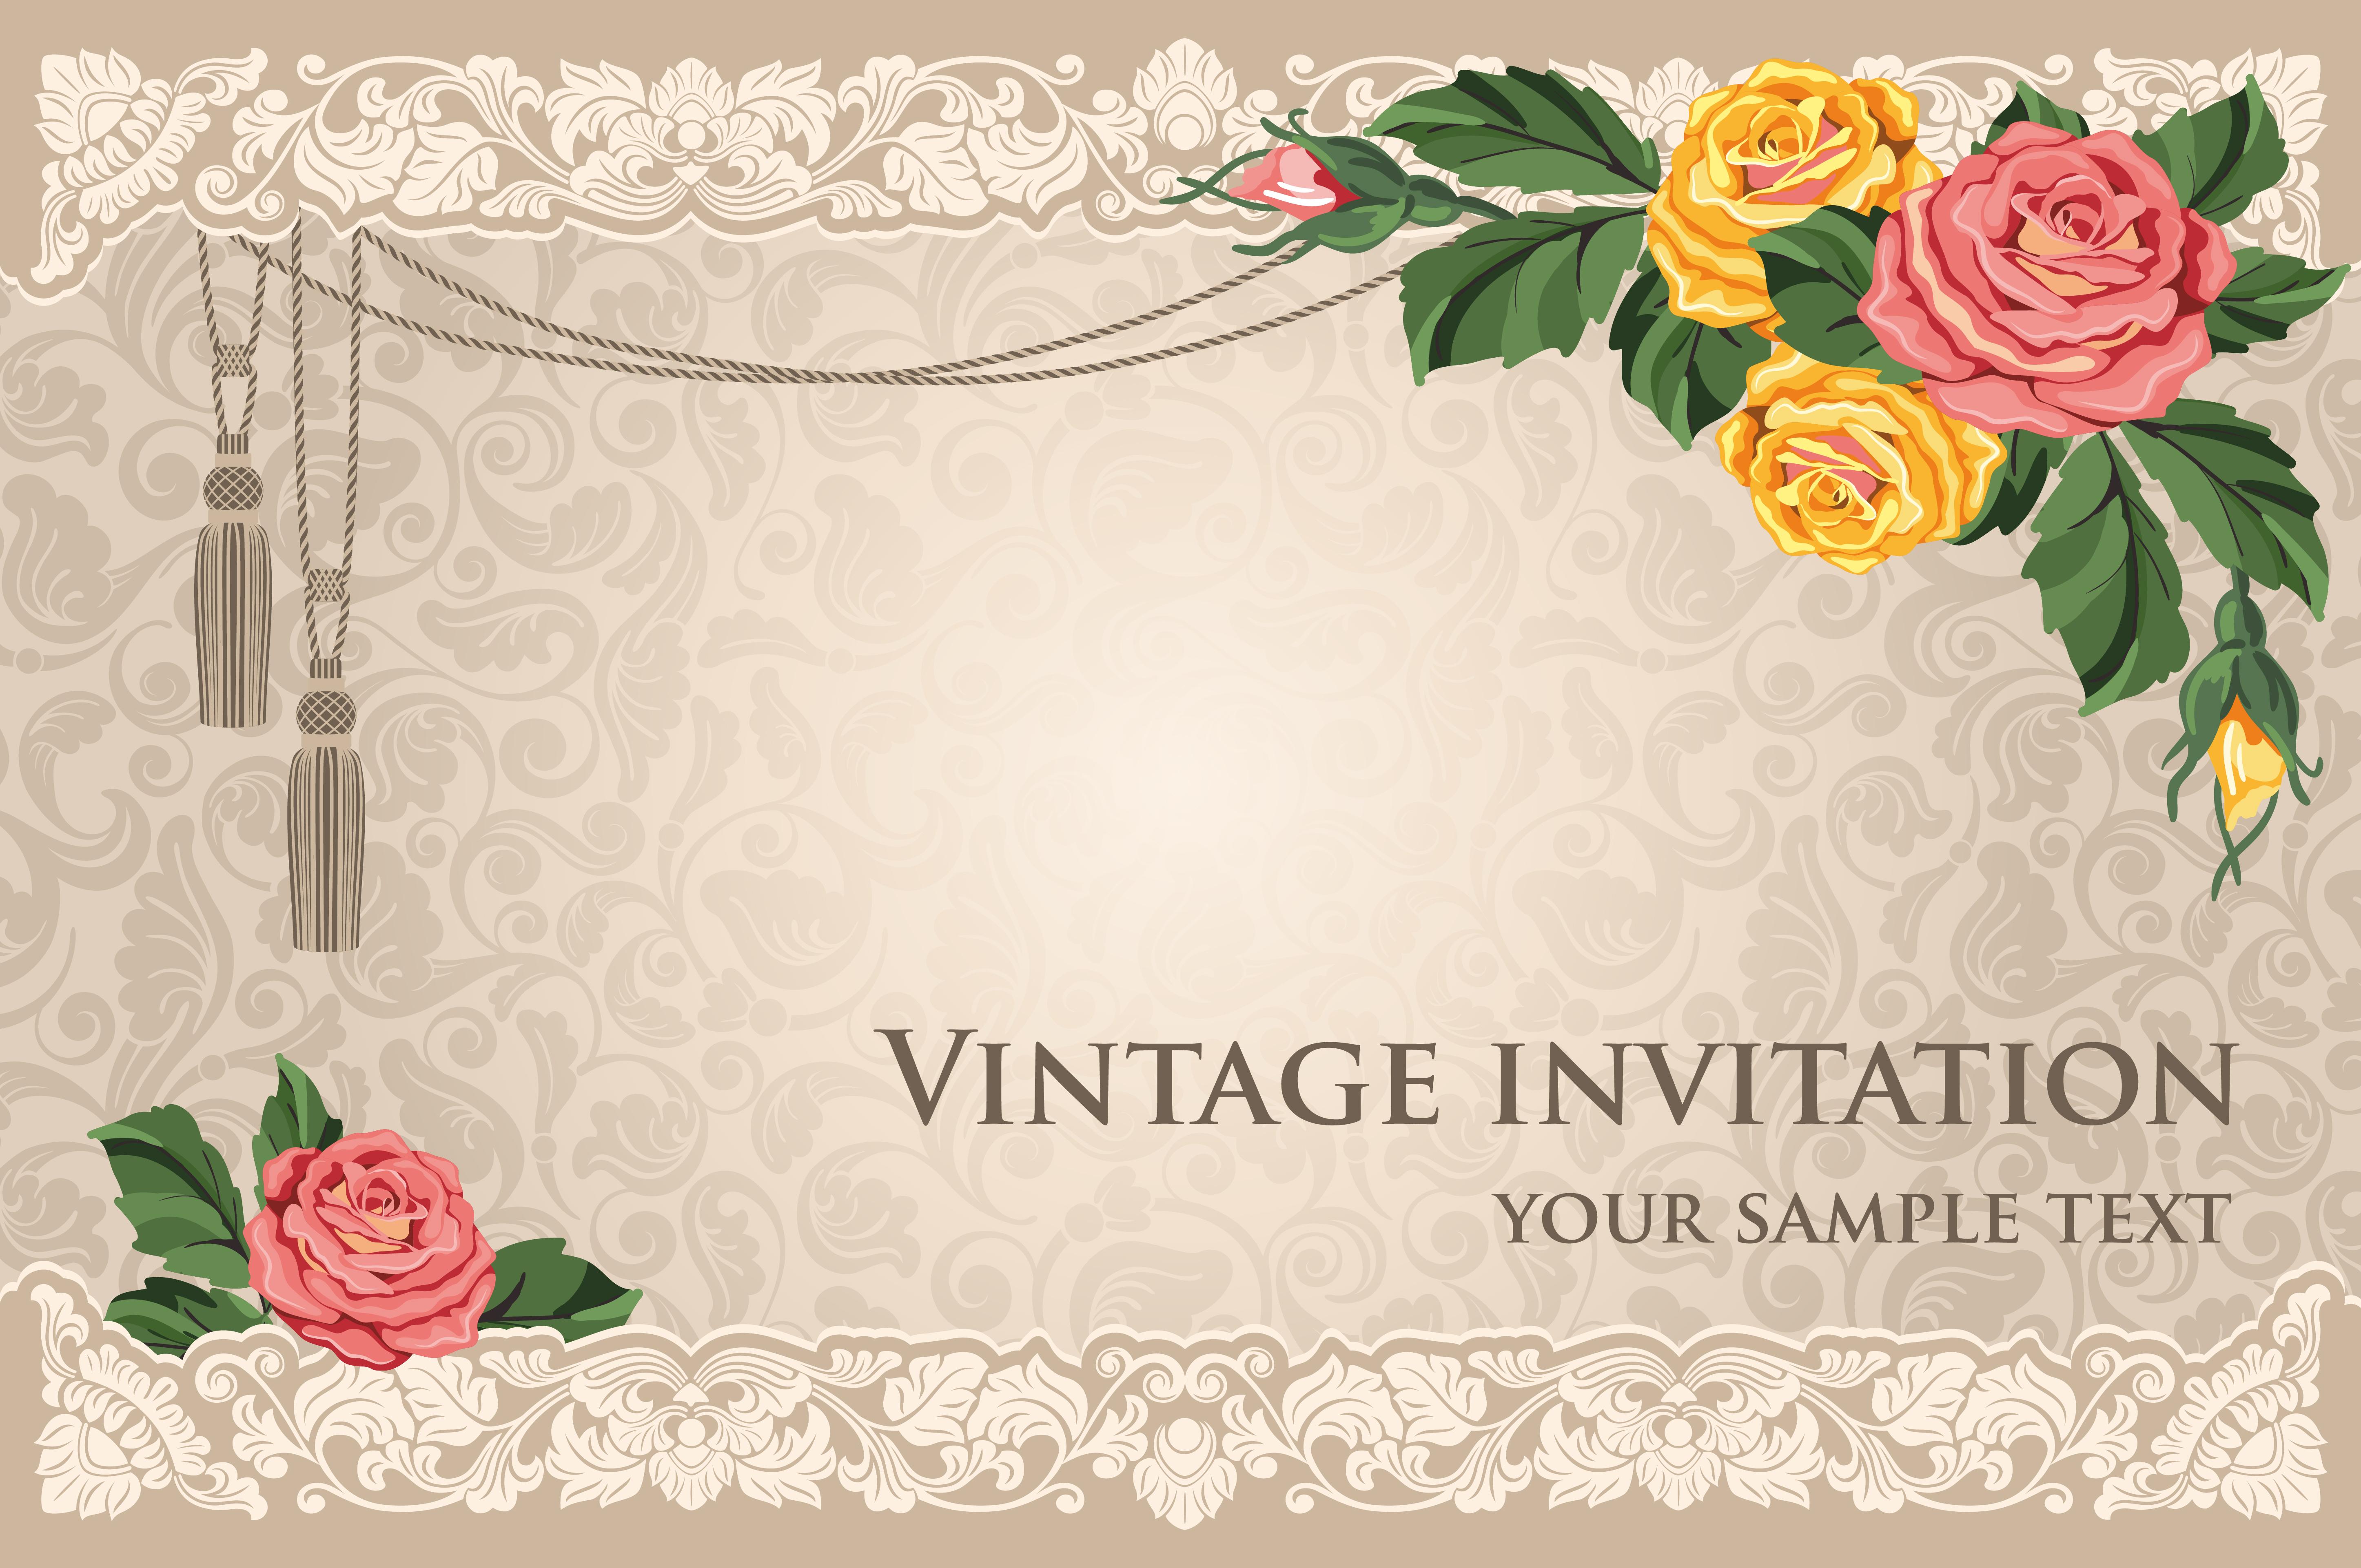 Wedding Invitation Card Background: Vintage Wedding Invitation Card Flower Pattern Vector